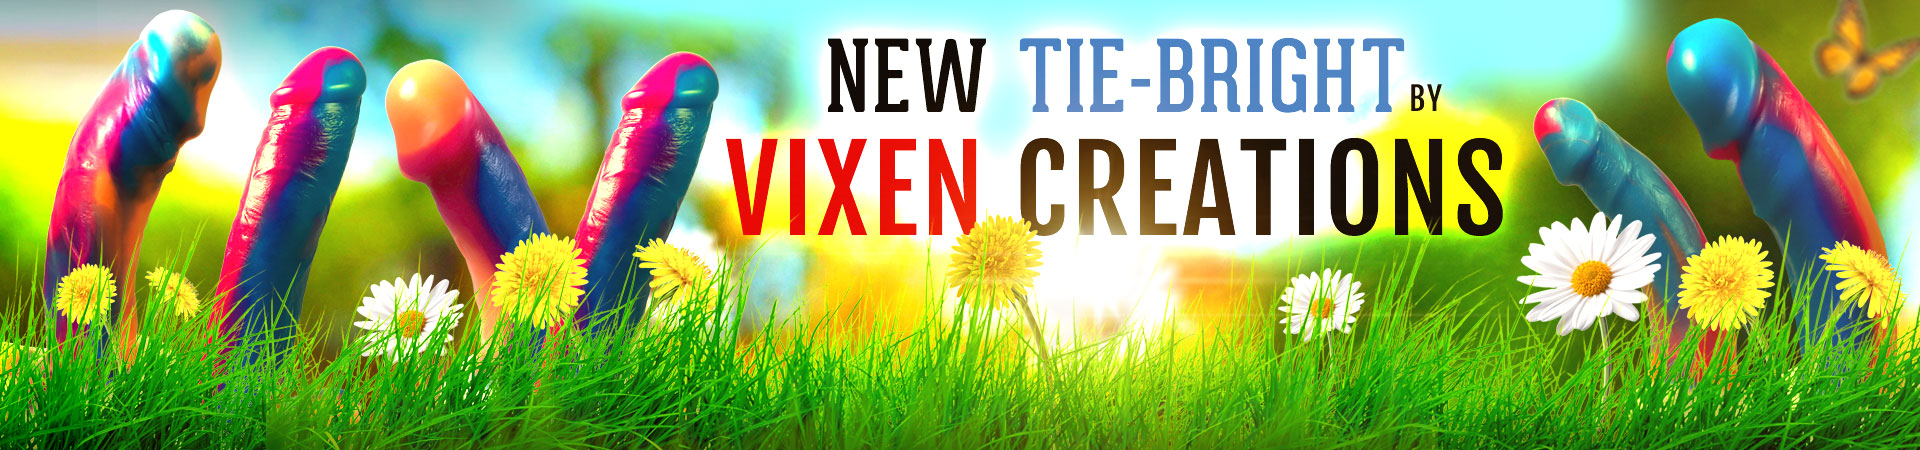 New Tie-Bright By Vixen Creations